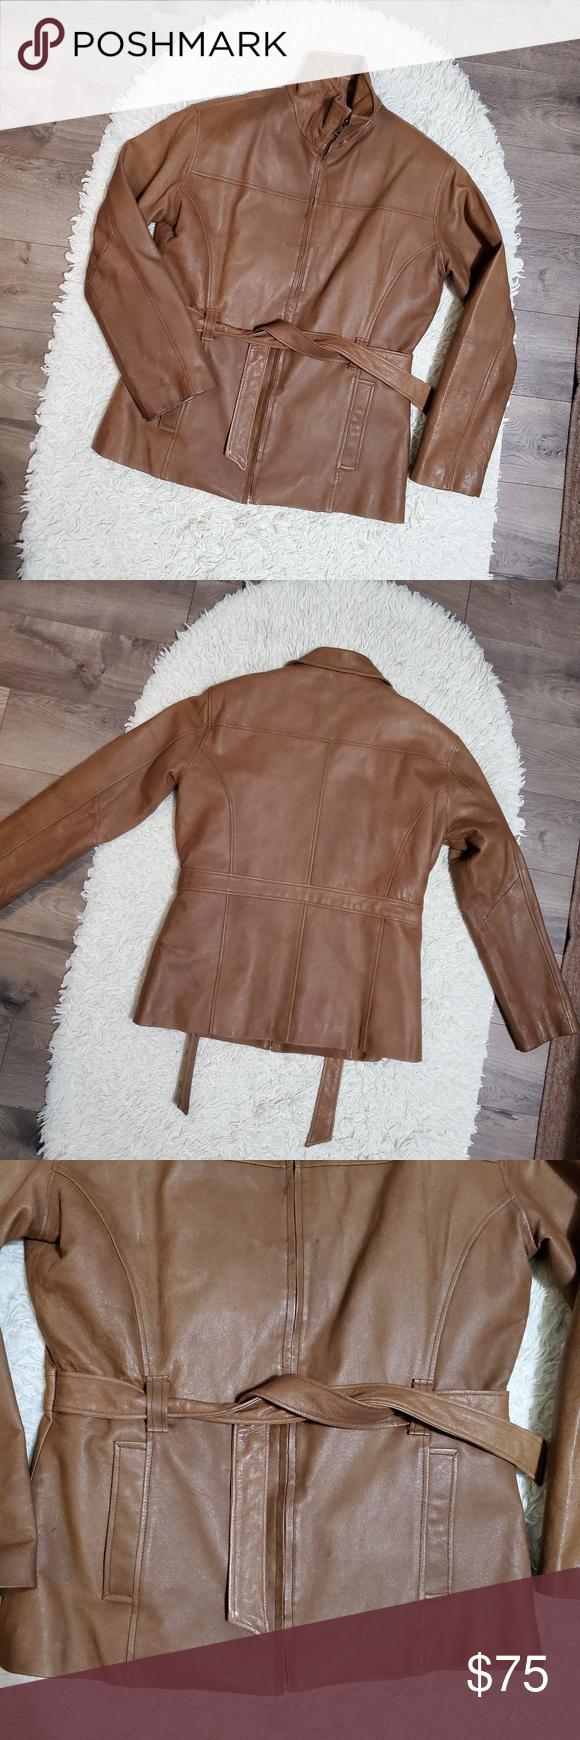 Vilanto Genuine Leather Jacket Vilanto Genuine Leather Cognac Jacket Size L Shell Genuine Leather Li Genuine Leather Jackets Clothes Design Leather Jacket [ 1740 x 580 Pixel ]